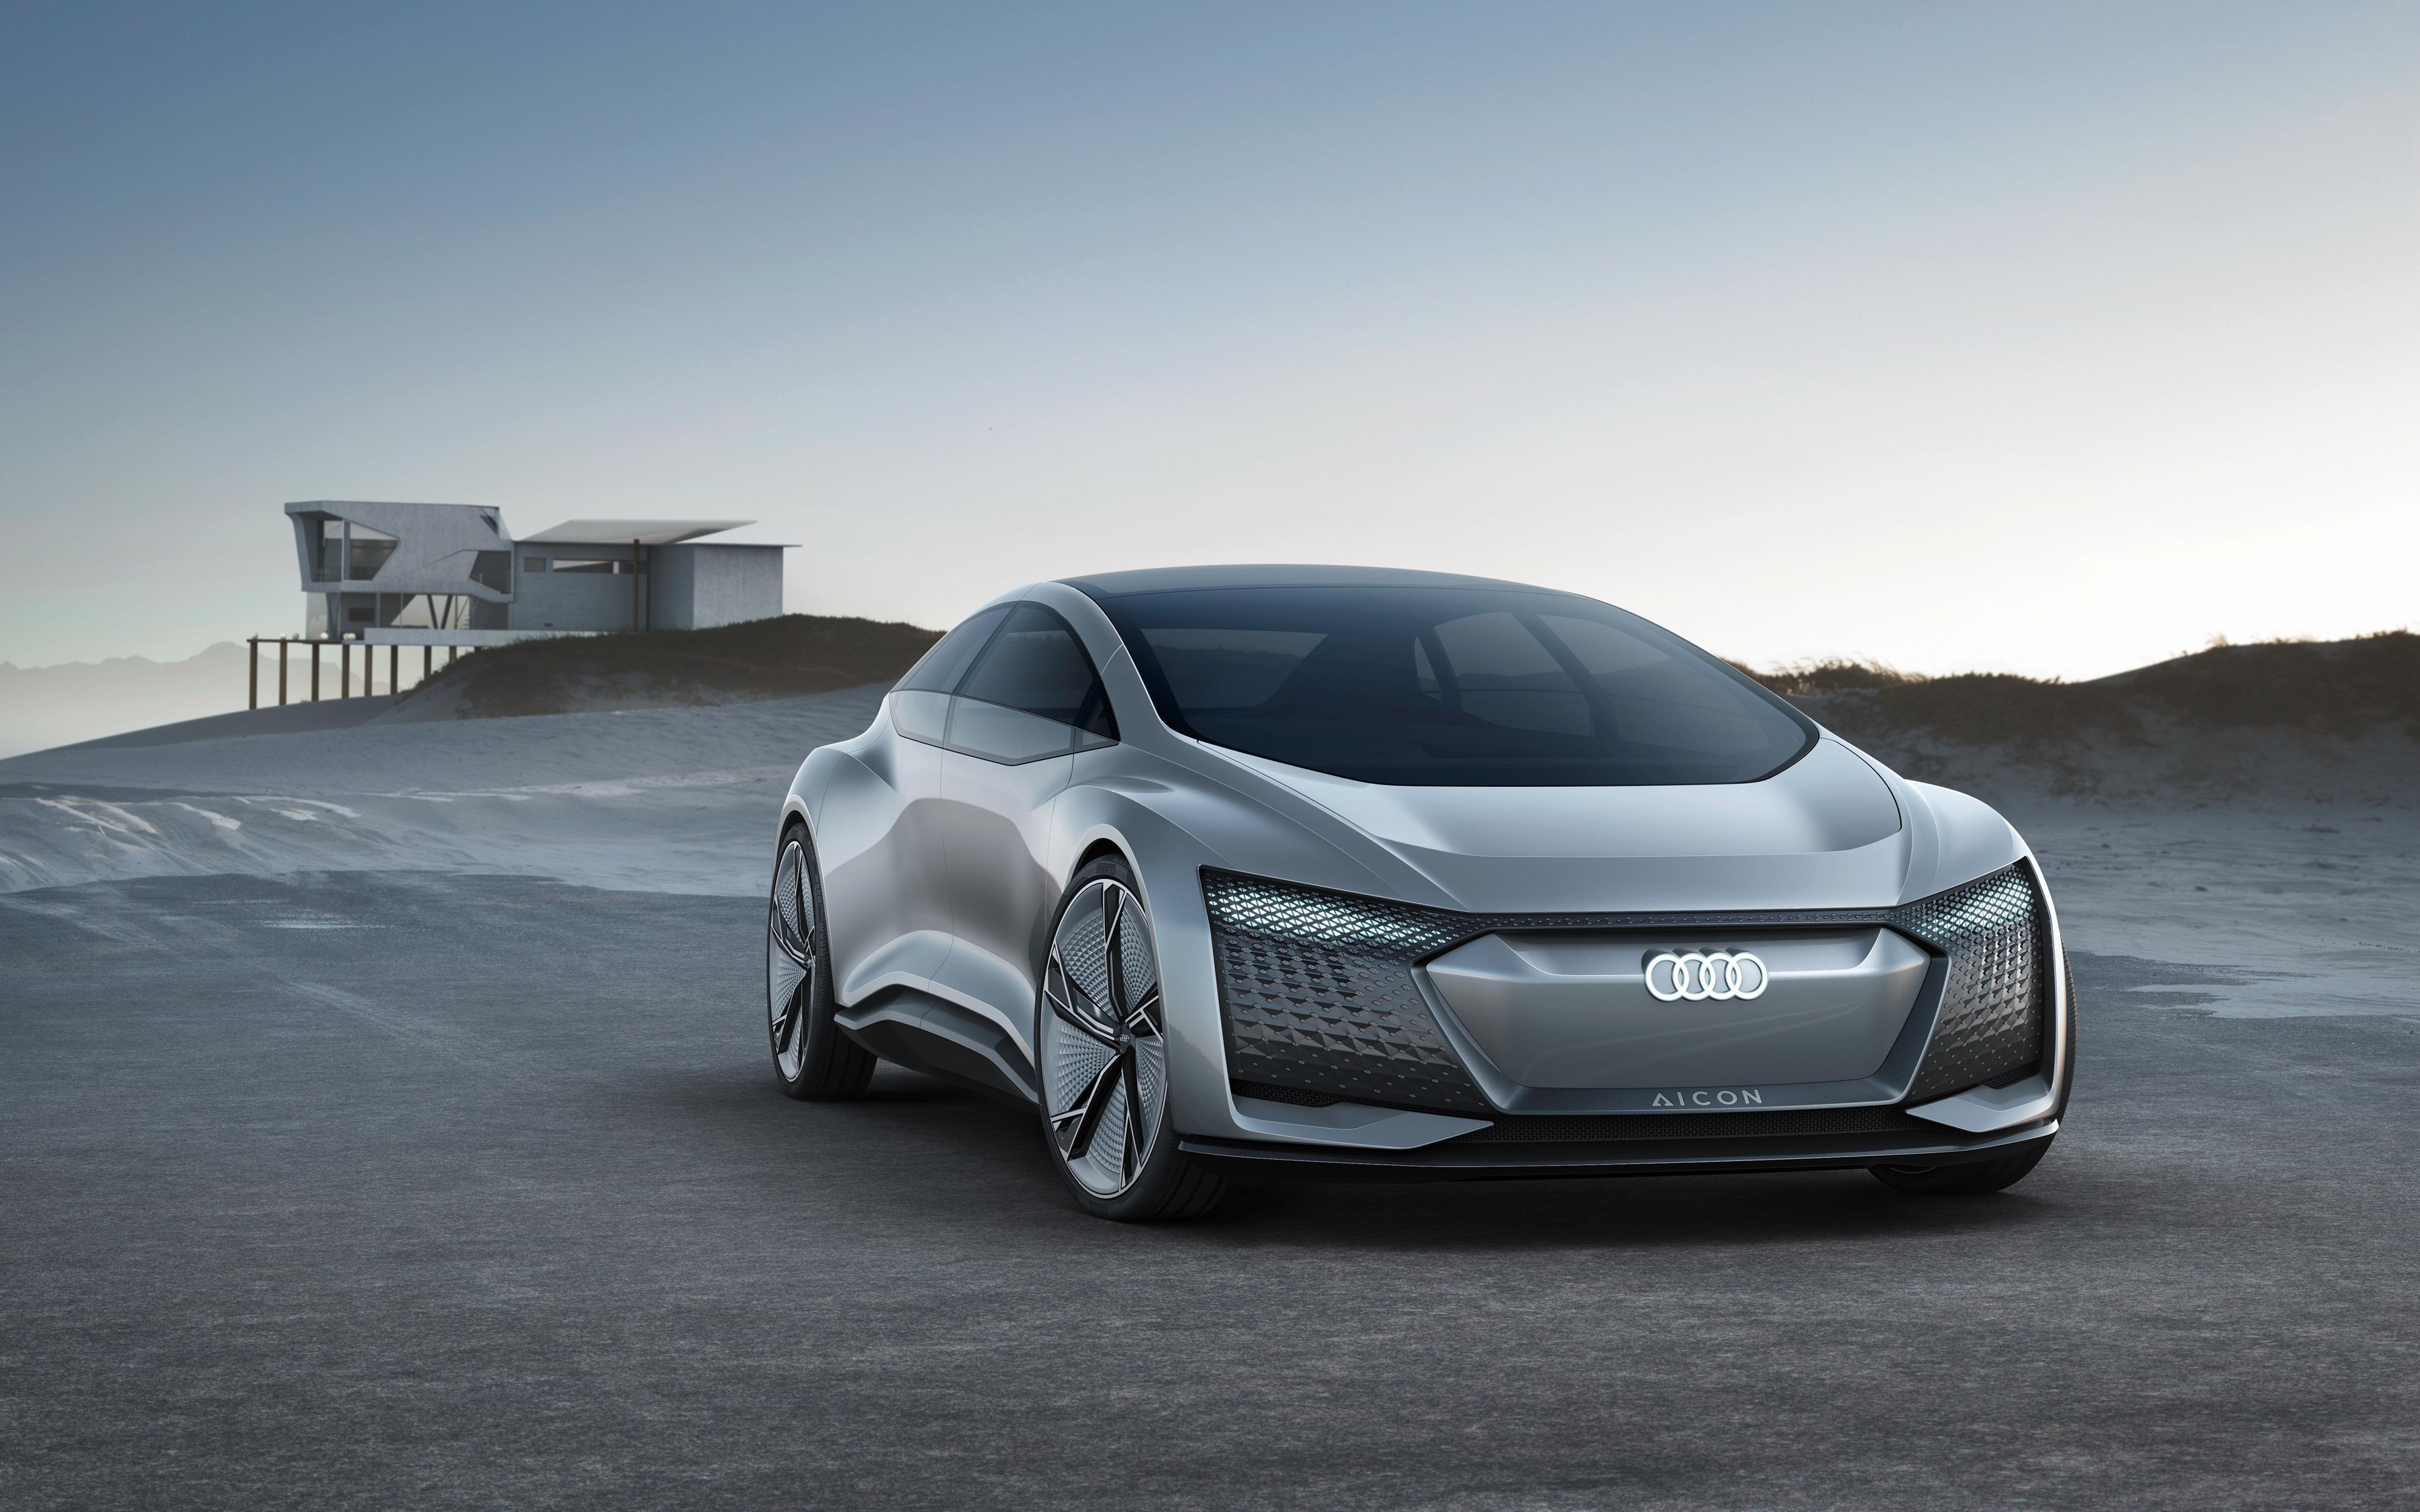 Wallpaper 4k Audi Aicon Autonomous Concept Car 4k Aicon